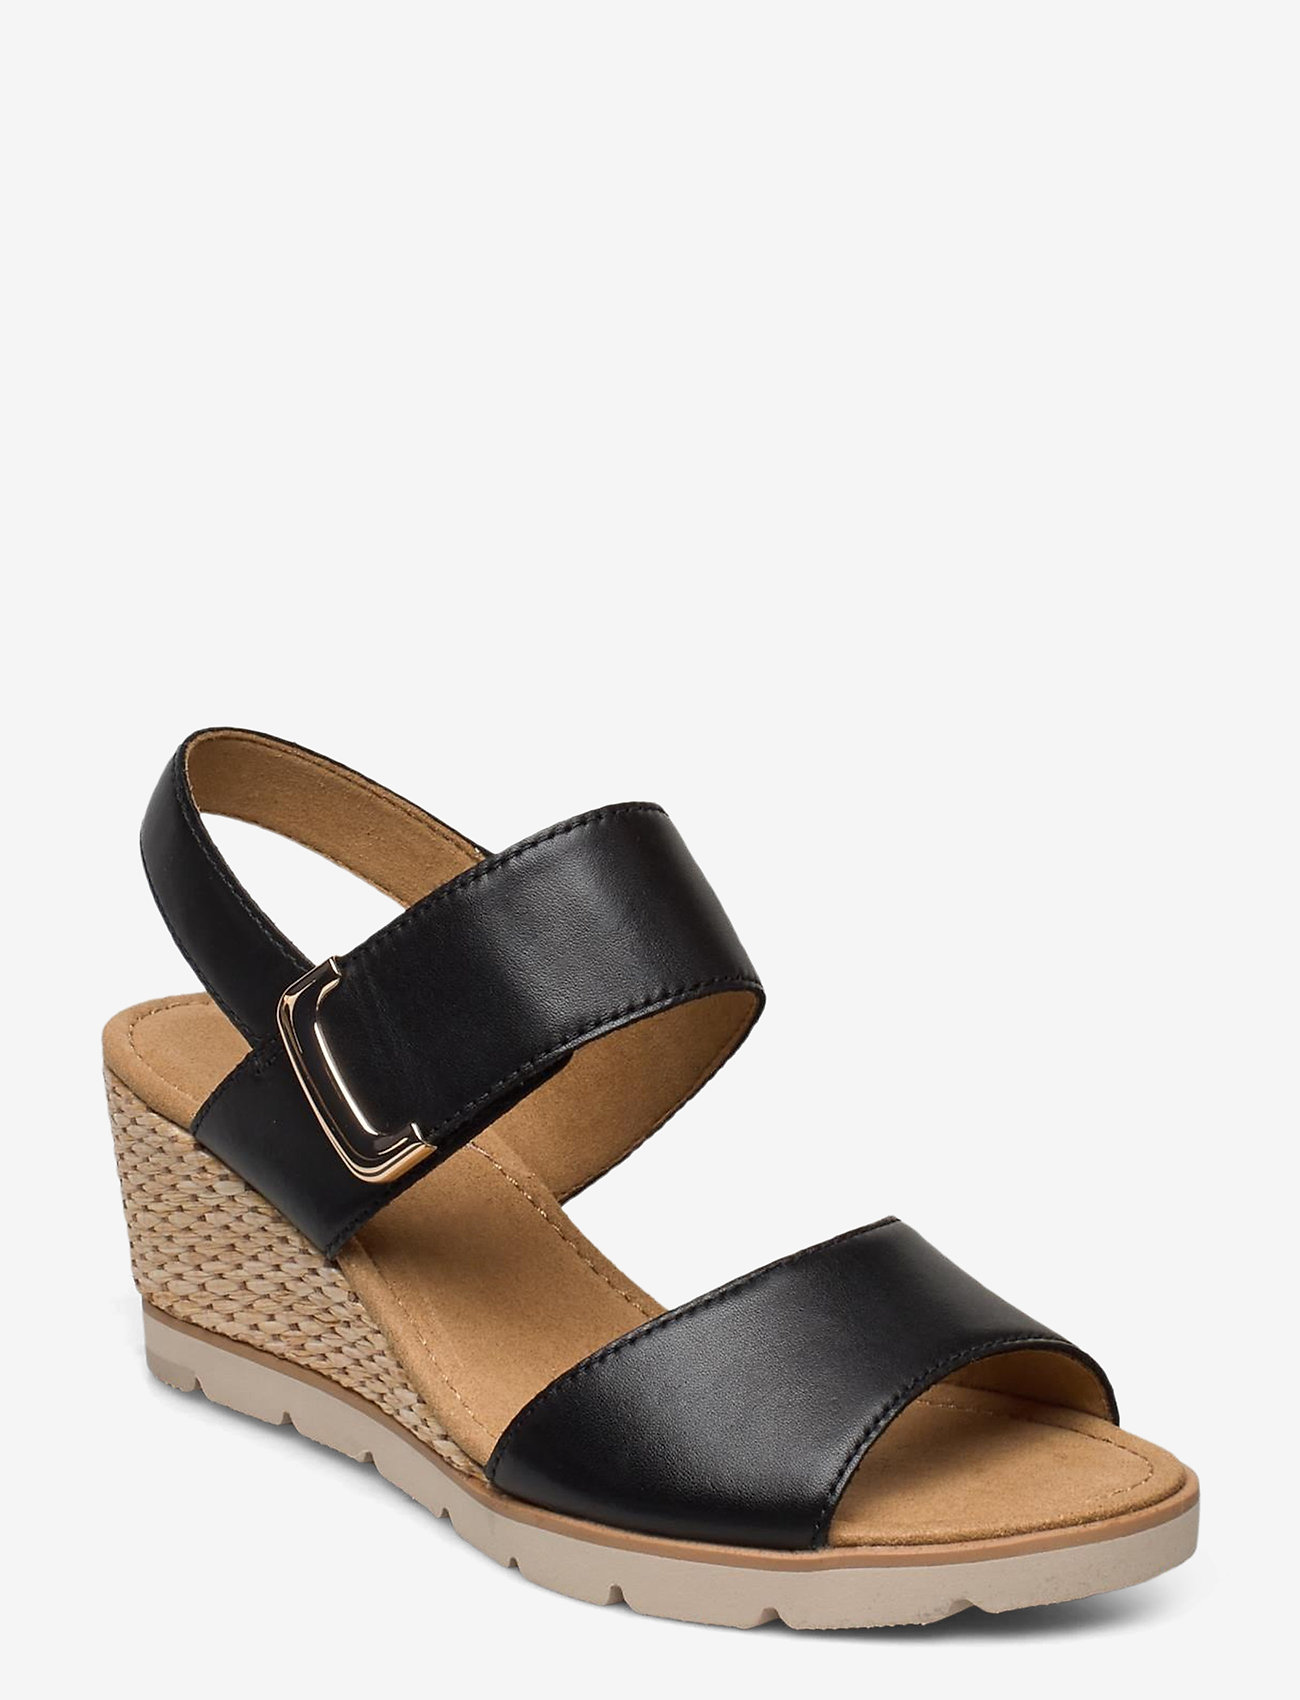 Gabor - sandals - espadrilles met sleehak - black - 0